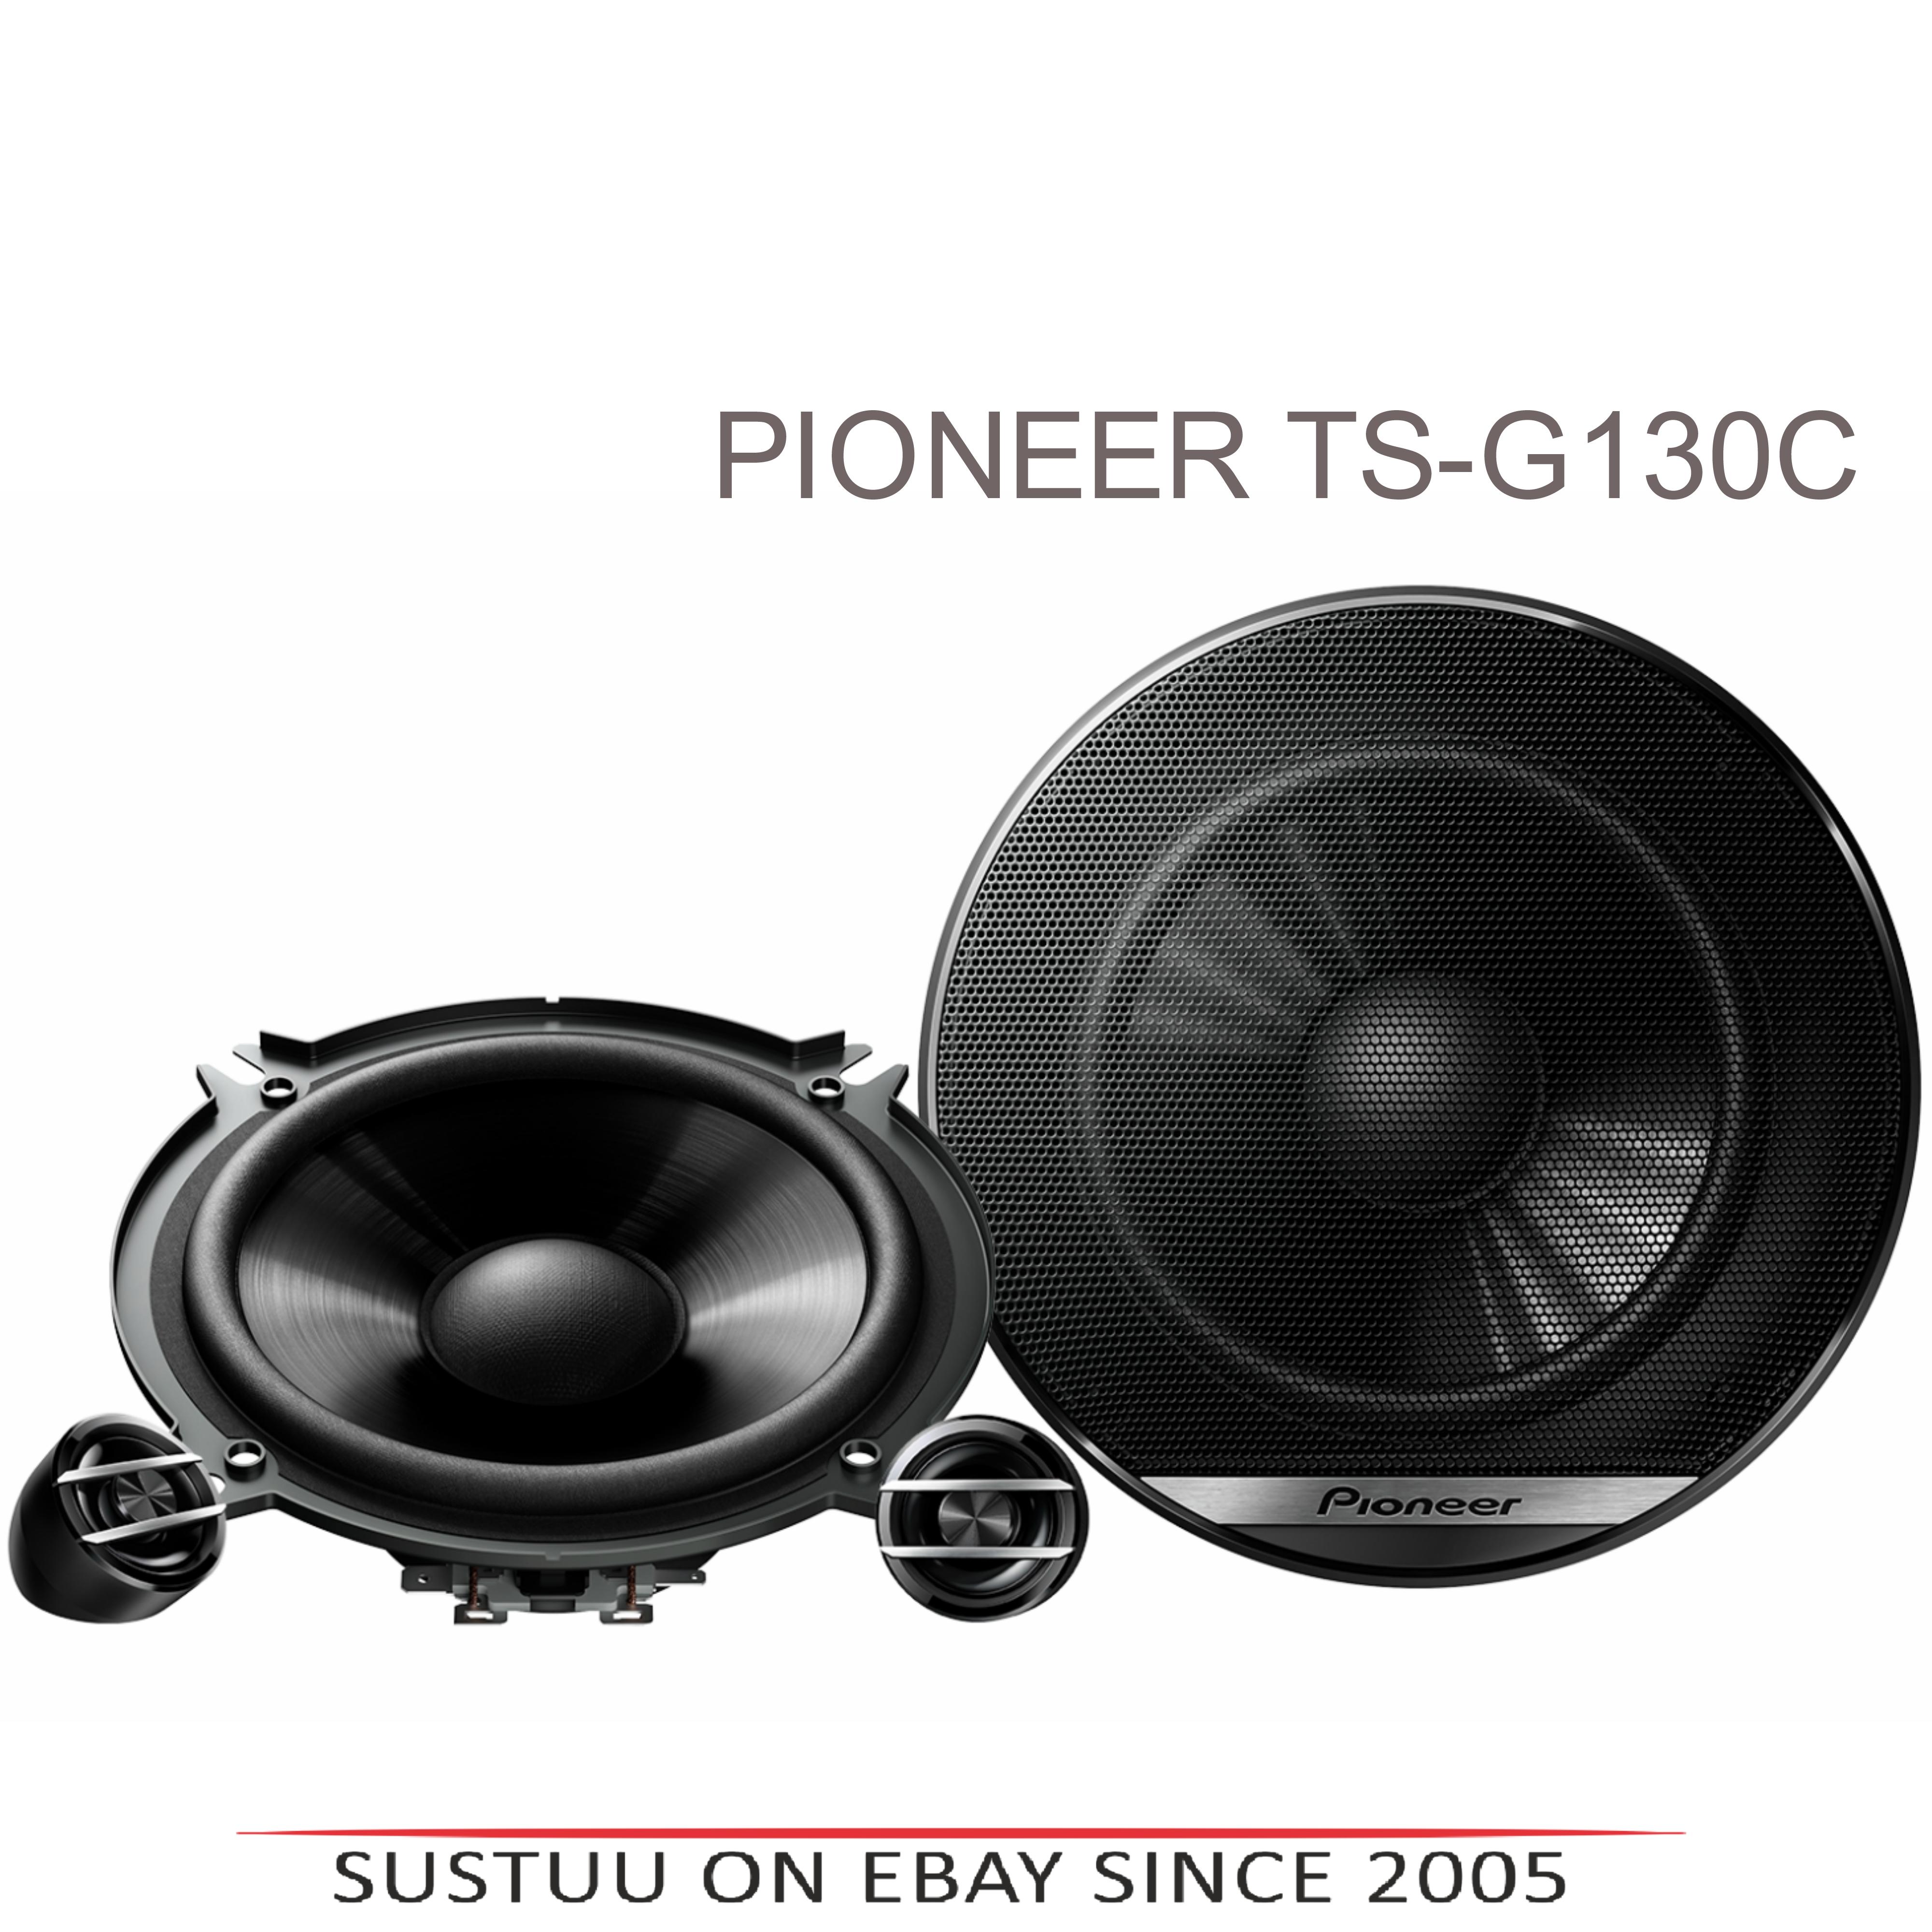 Pioneer TS G130C|In Car 2-way Speakers|G Series|Door-Shelf|13cm|40-220watts